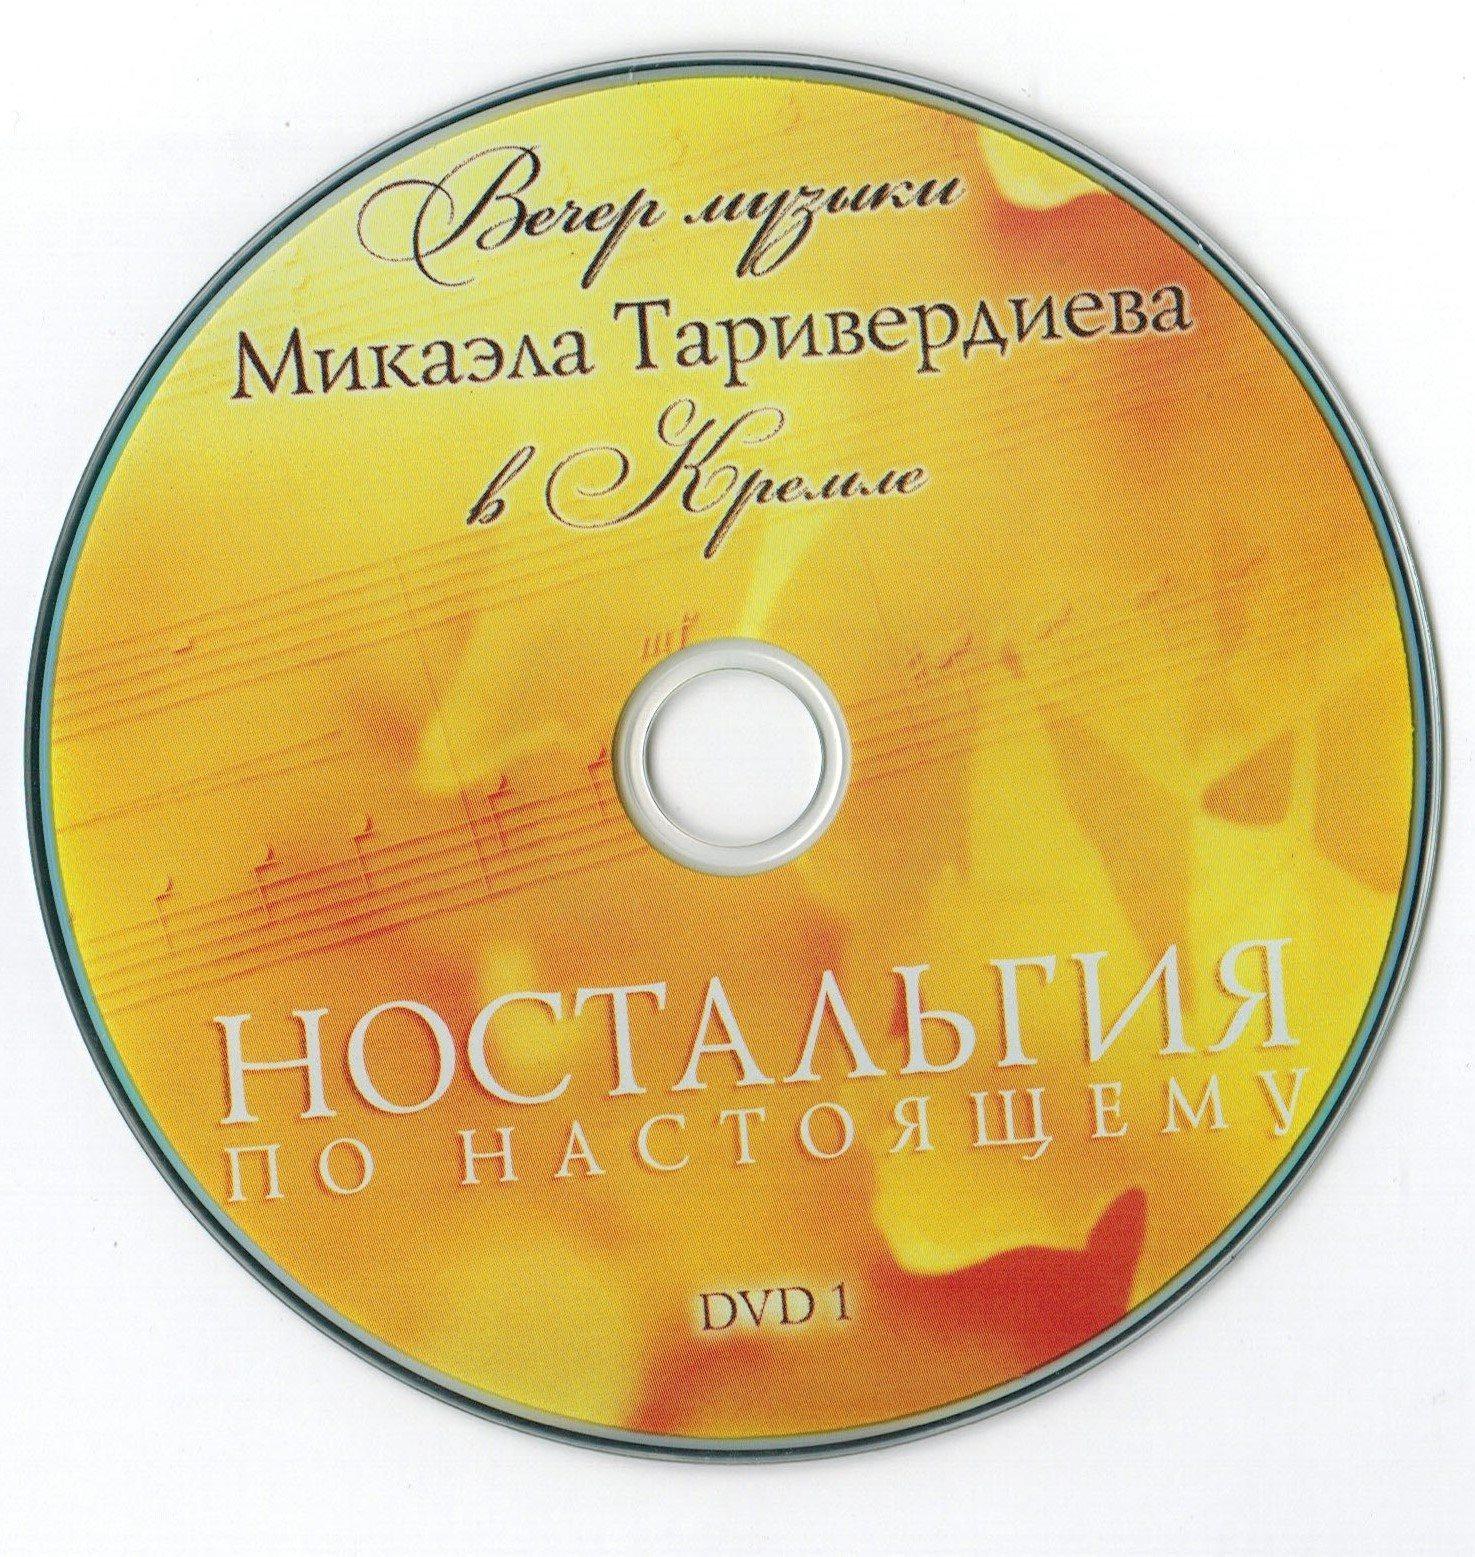 http://i4.imageban.ru/out/2014/07/30/4c79c7f5f9d4165f9cf4045915d1a627.jpg